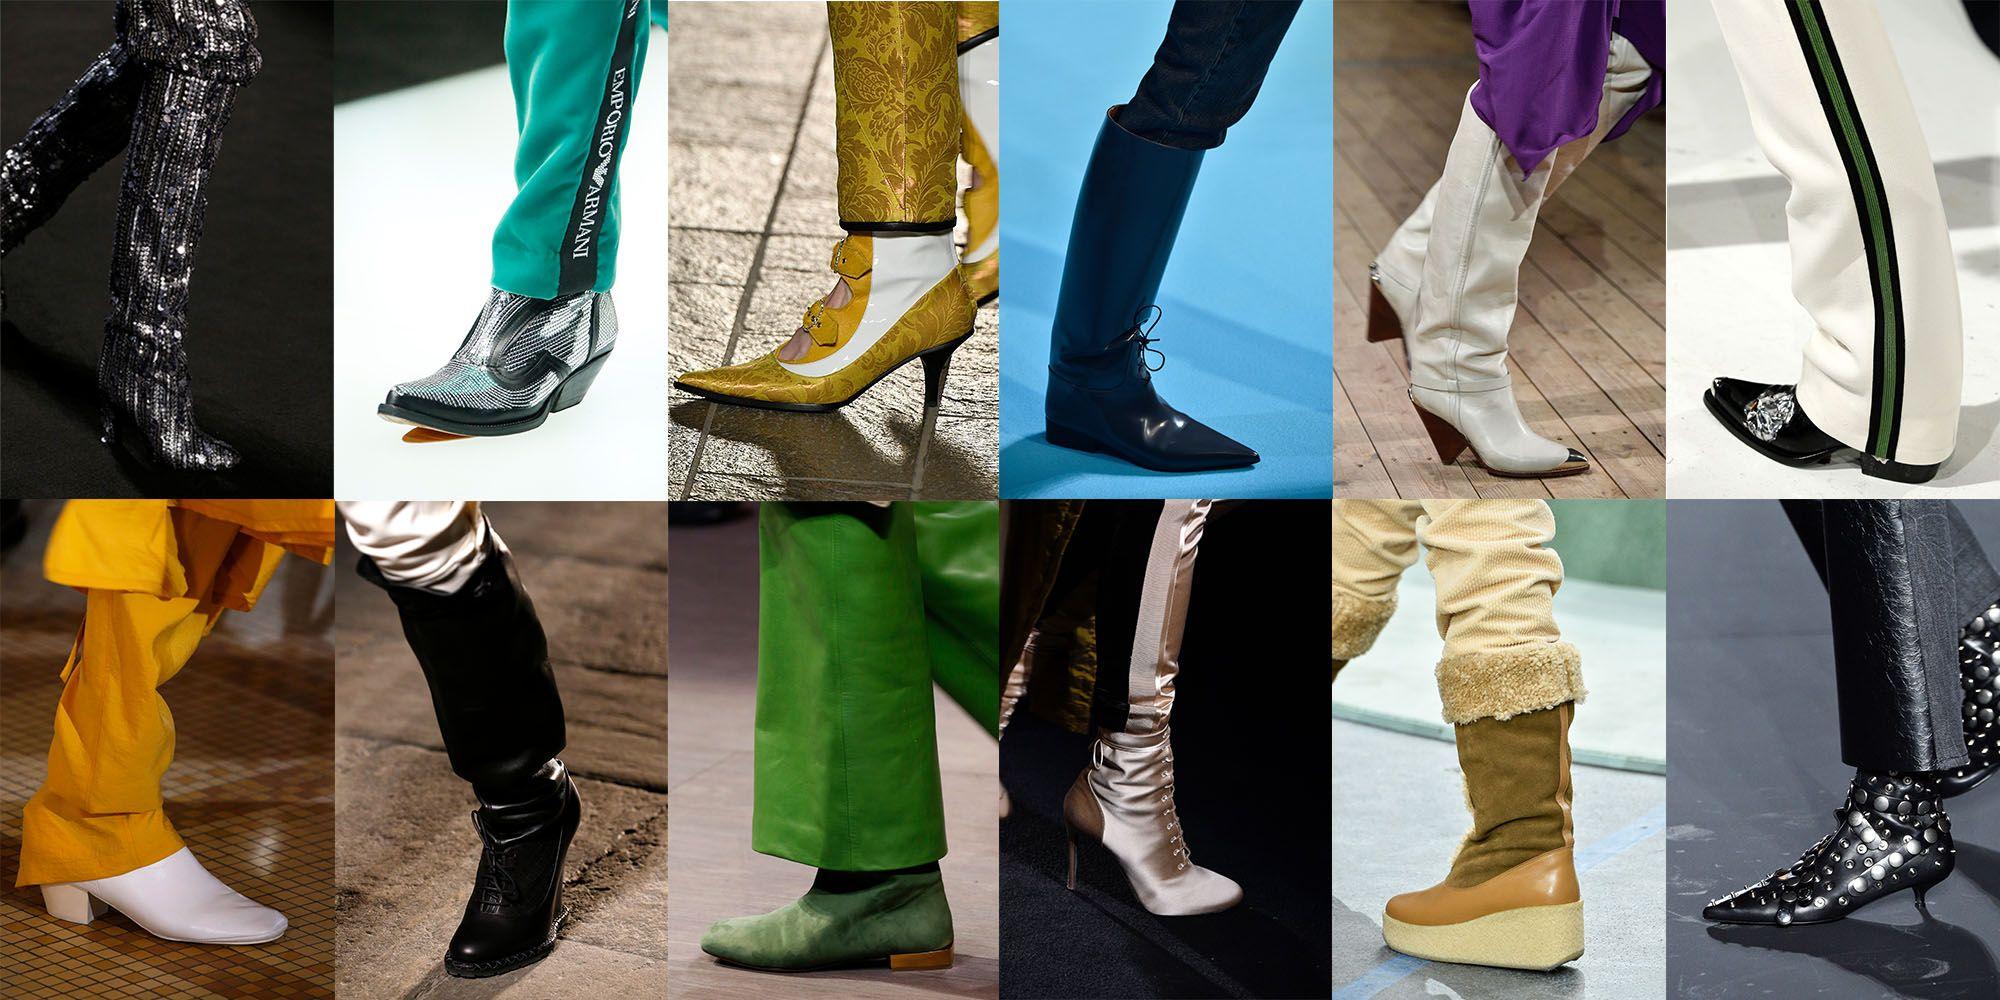 Fall winter schoenen trends 2018/2019